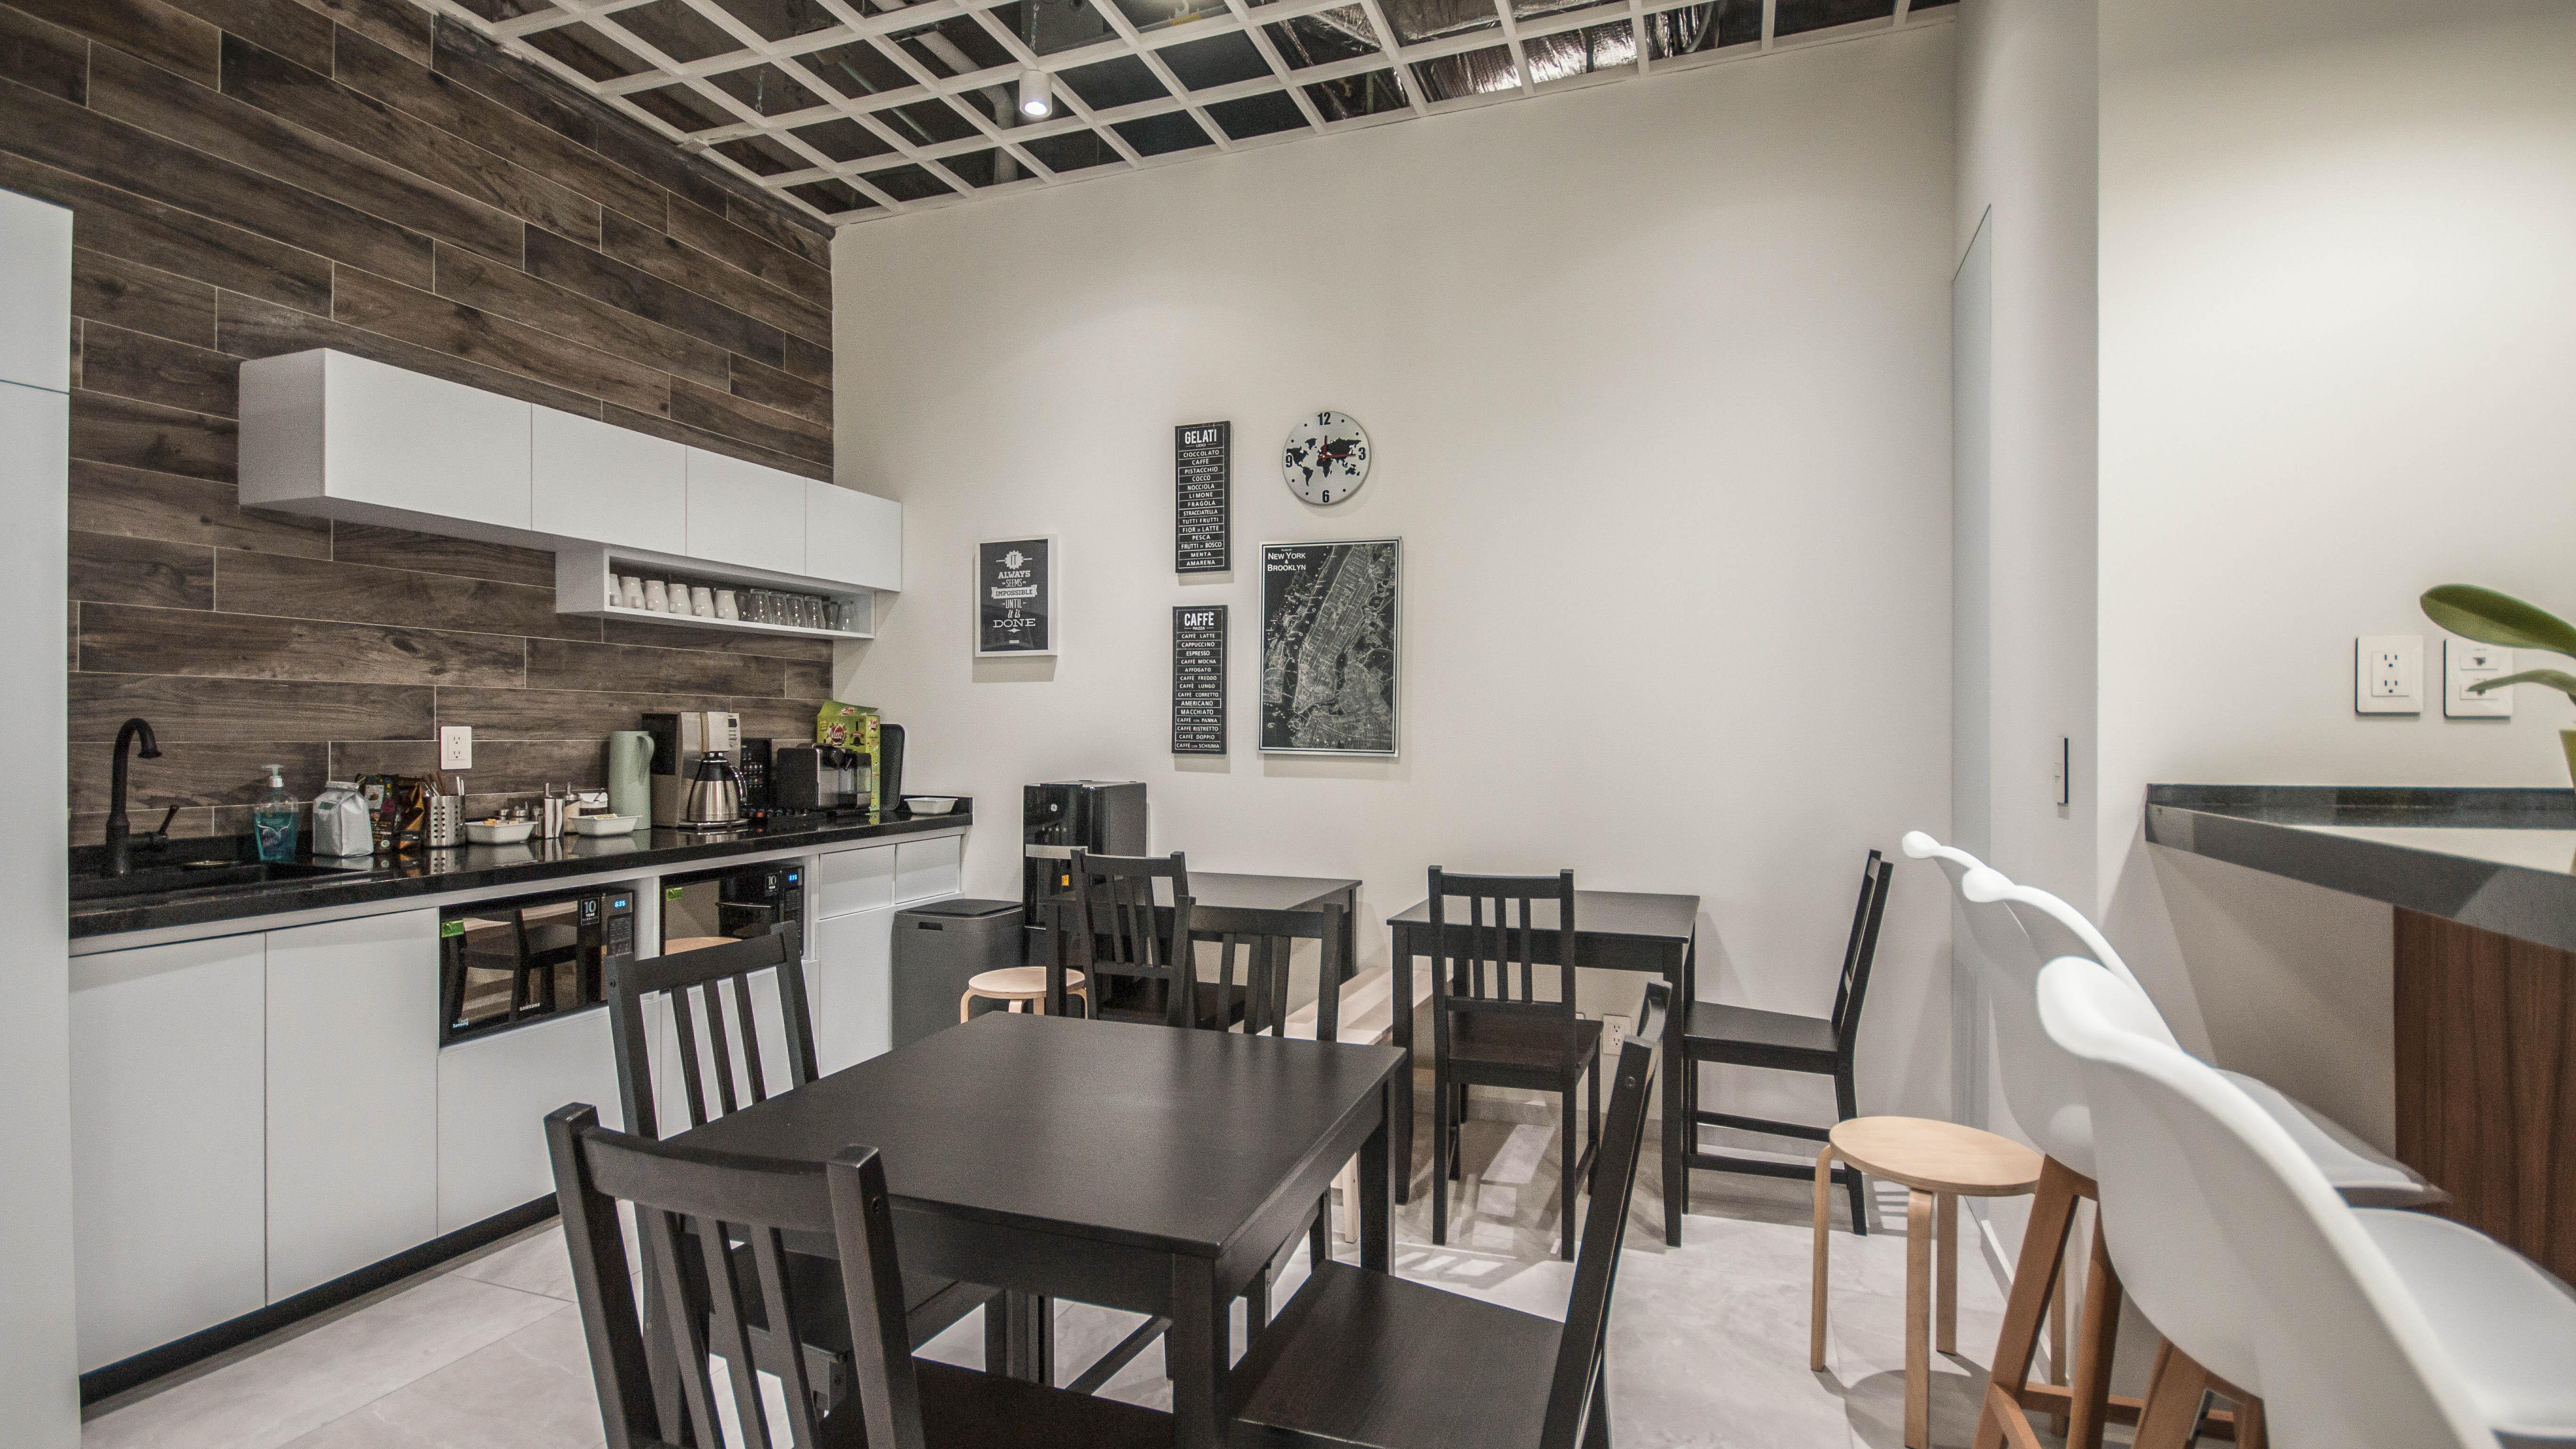 Break Room - Kitchen Area - Guadalajara Virtual Office